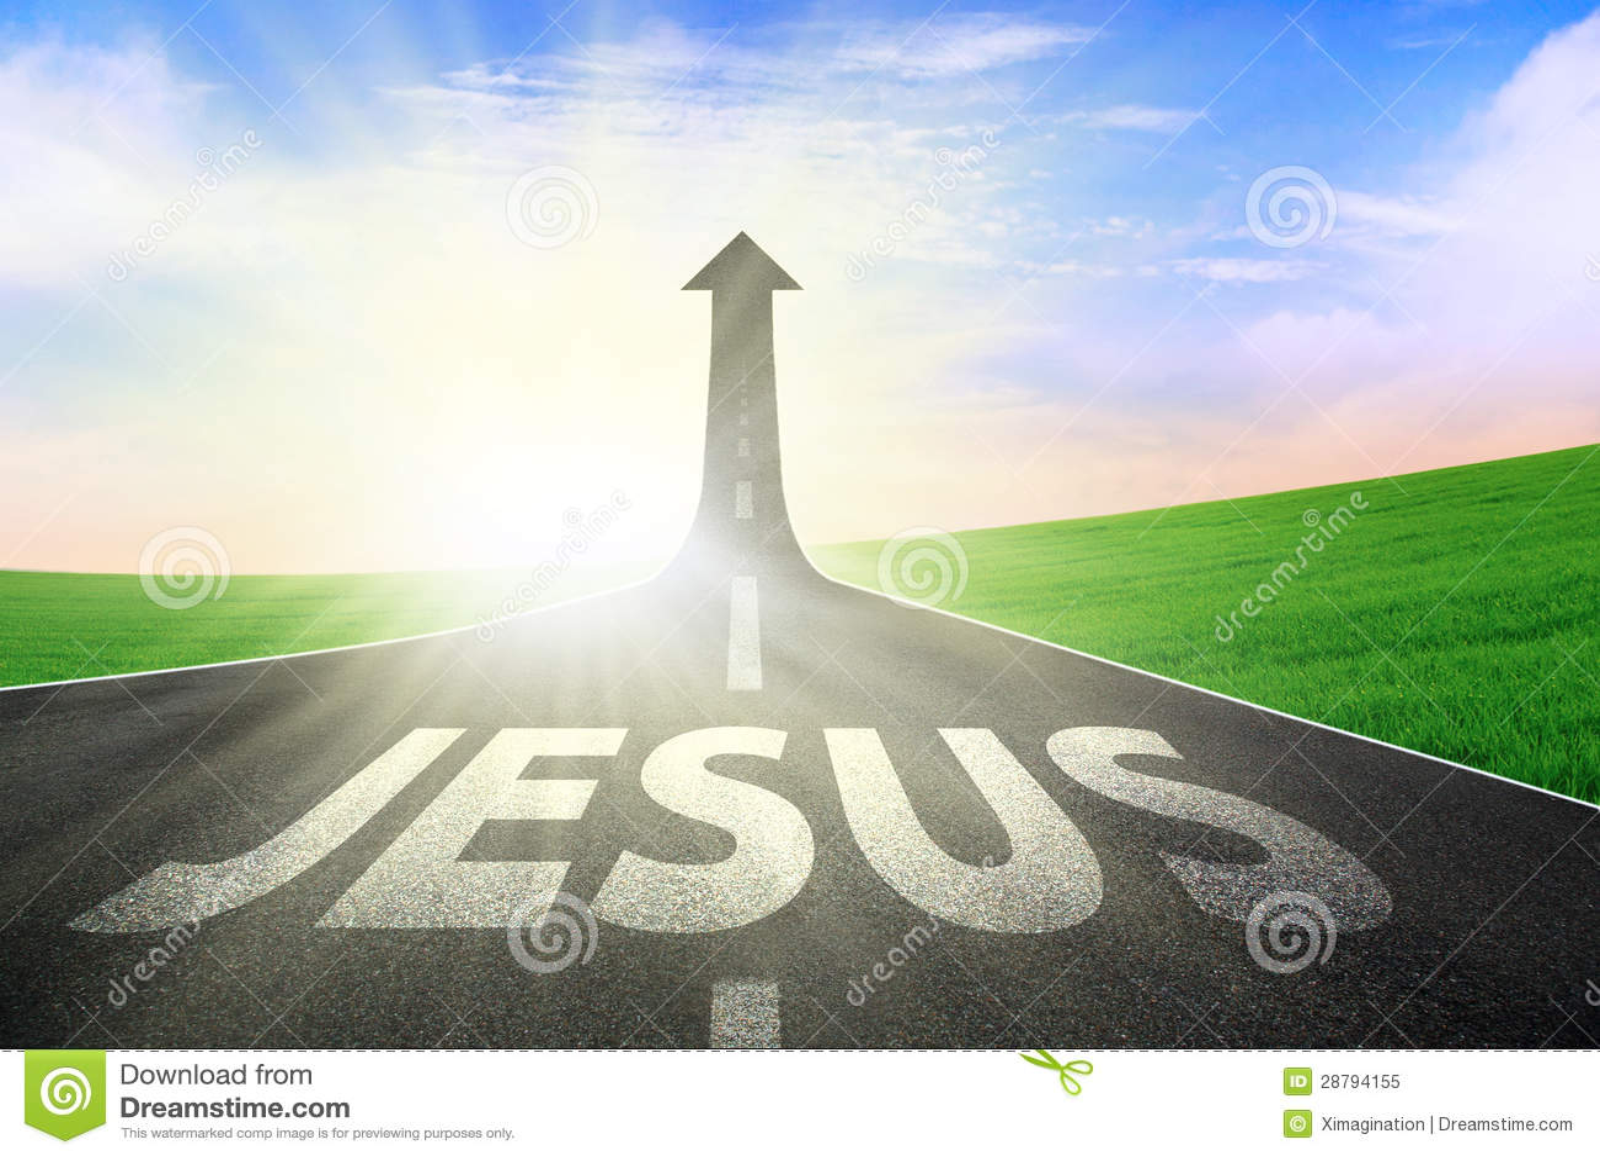 Jesus Clip Art Free Pictures